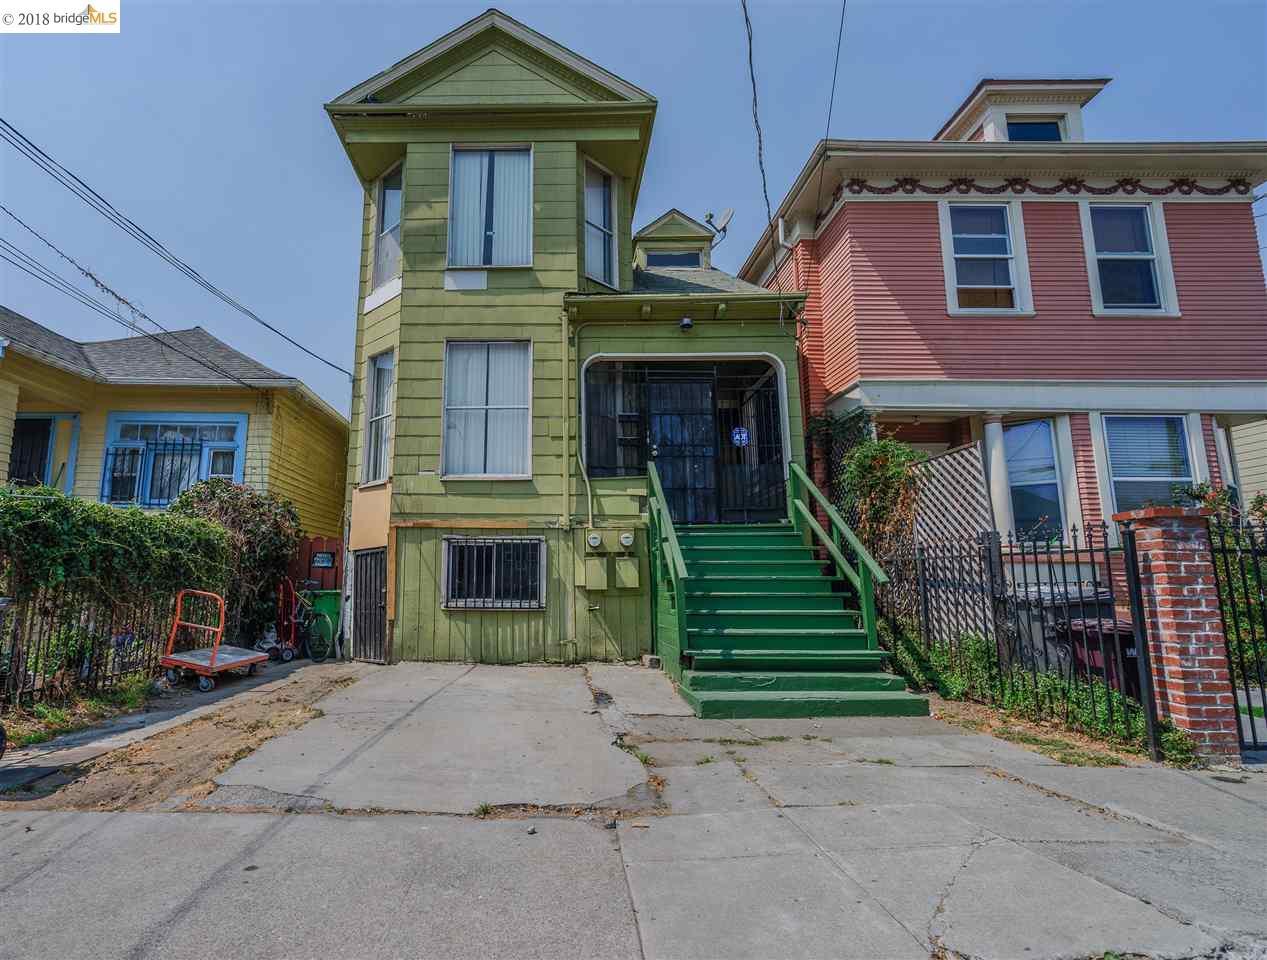 Multi-Family Home for Sale at 3107 Filbert 3107 Filbert Oakland, California 94608 United States